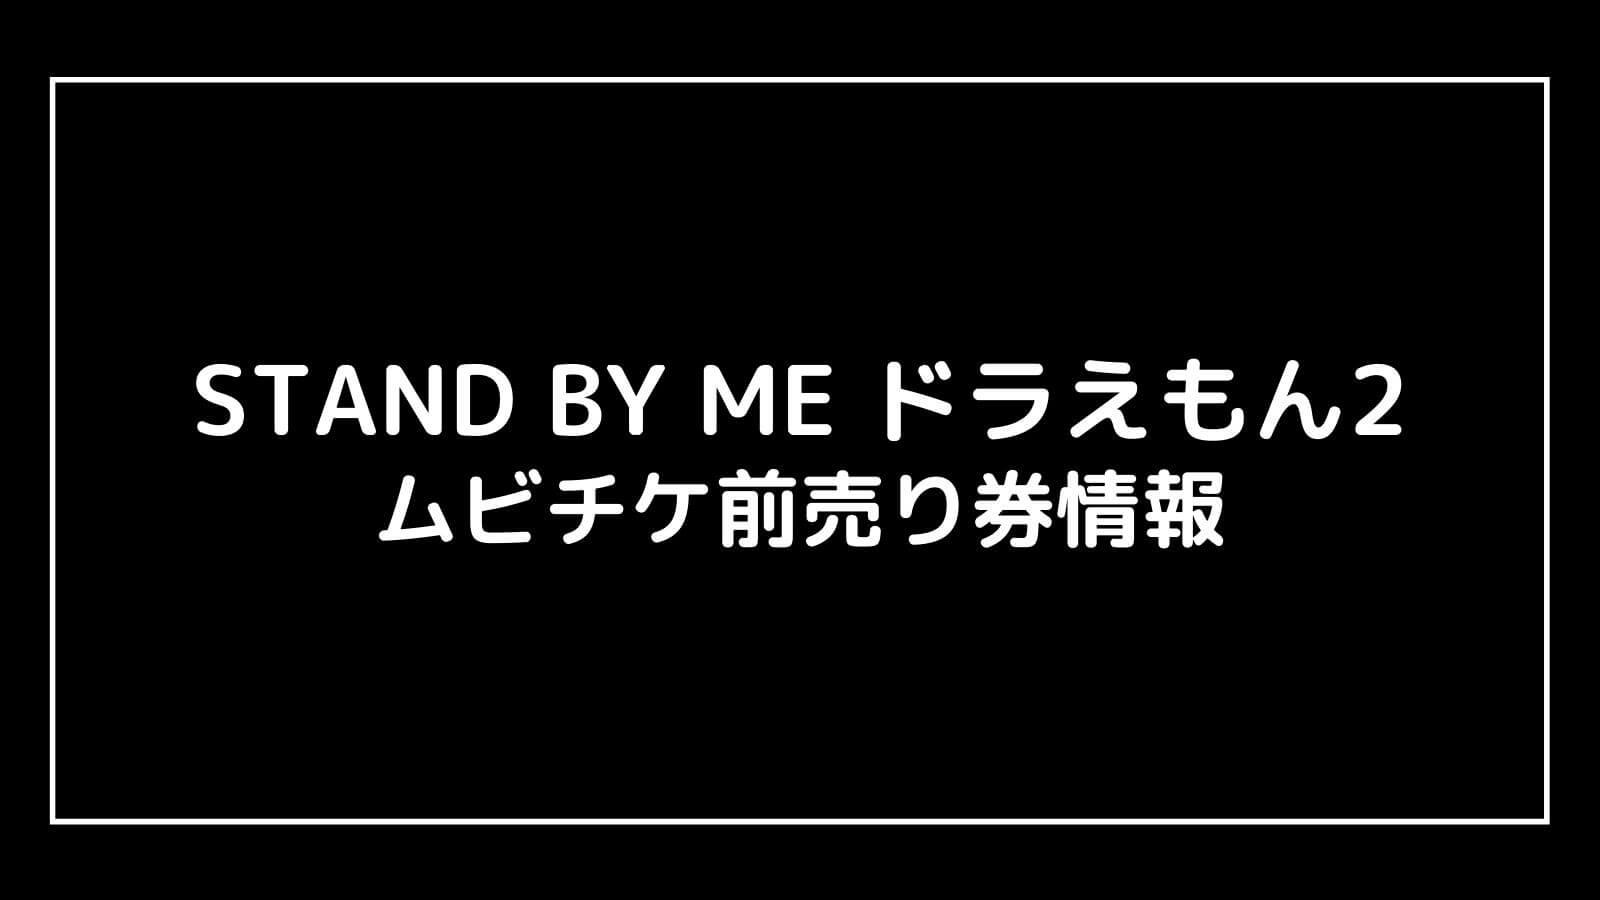 『STAND BY ME ドラえもん2』特典付きムビチケ前売り券はいつ発売?